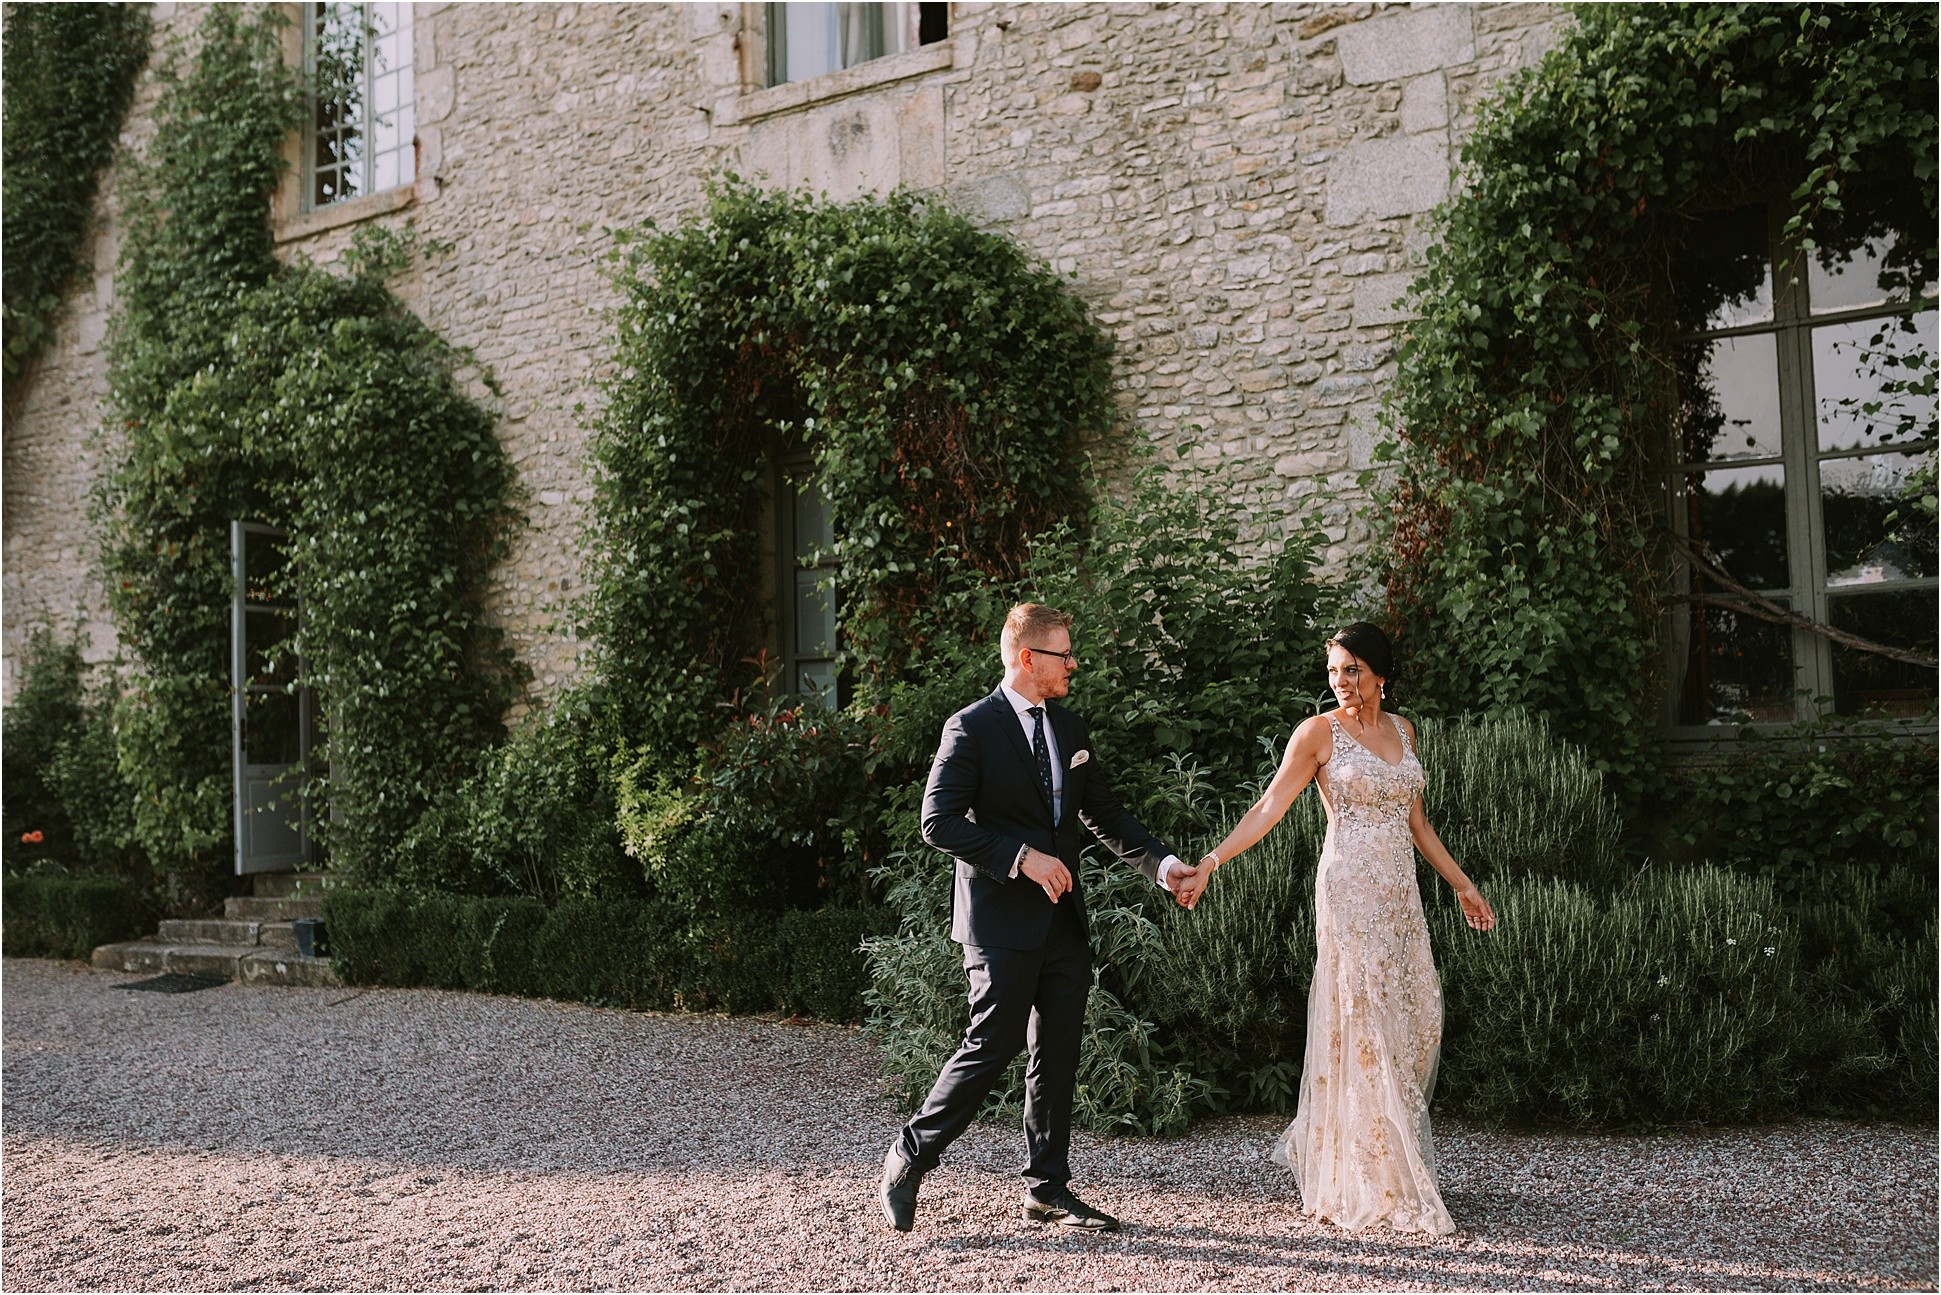 Kateryna-photos-photographe-mariage-chateau-st-paterne-mayenne-normandie_0183.jpg